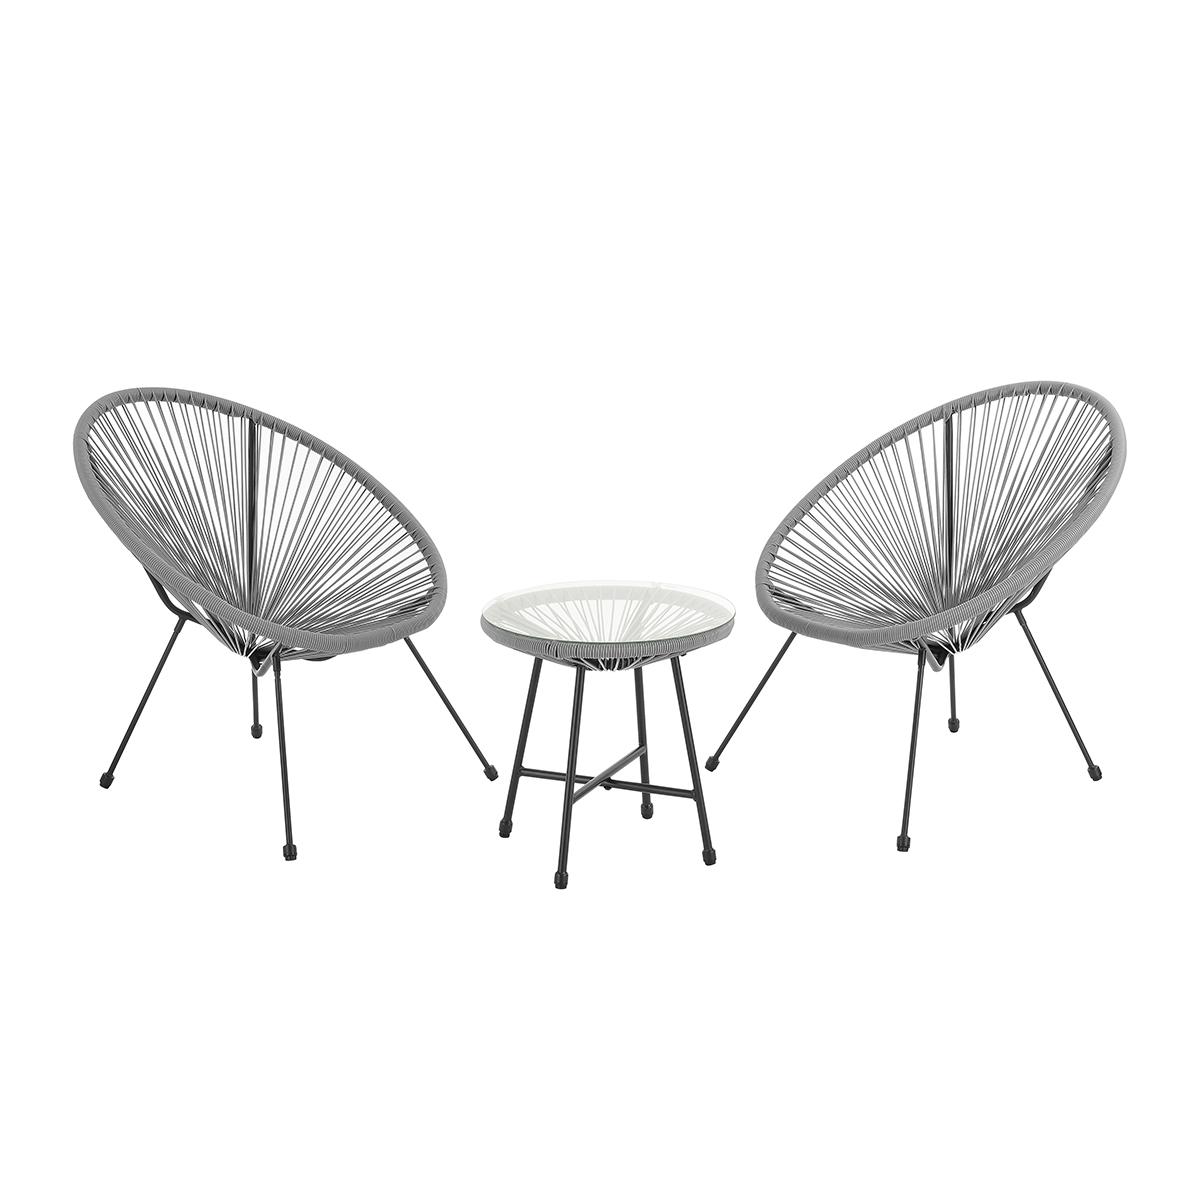 92259 SVITA BALI Balkon-Möbel 3-tlg. Polyrattan Lounge-Set Balkon-Set Grau